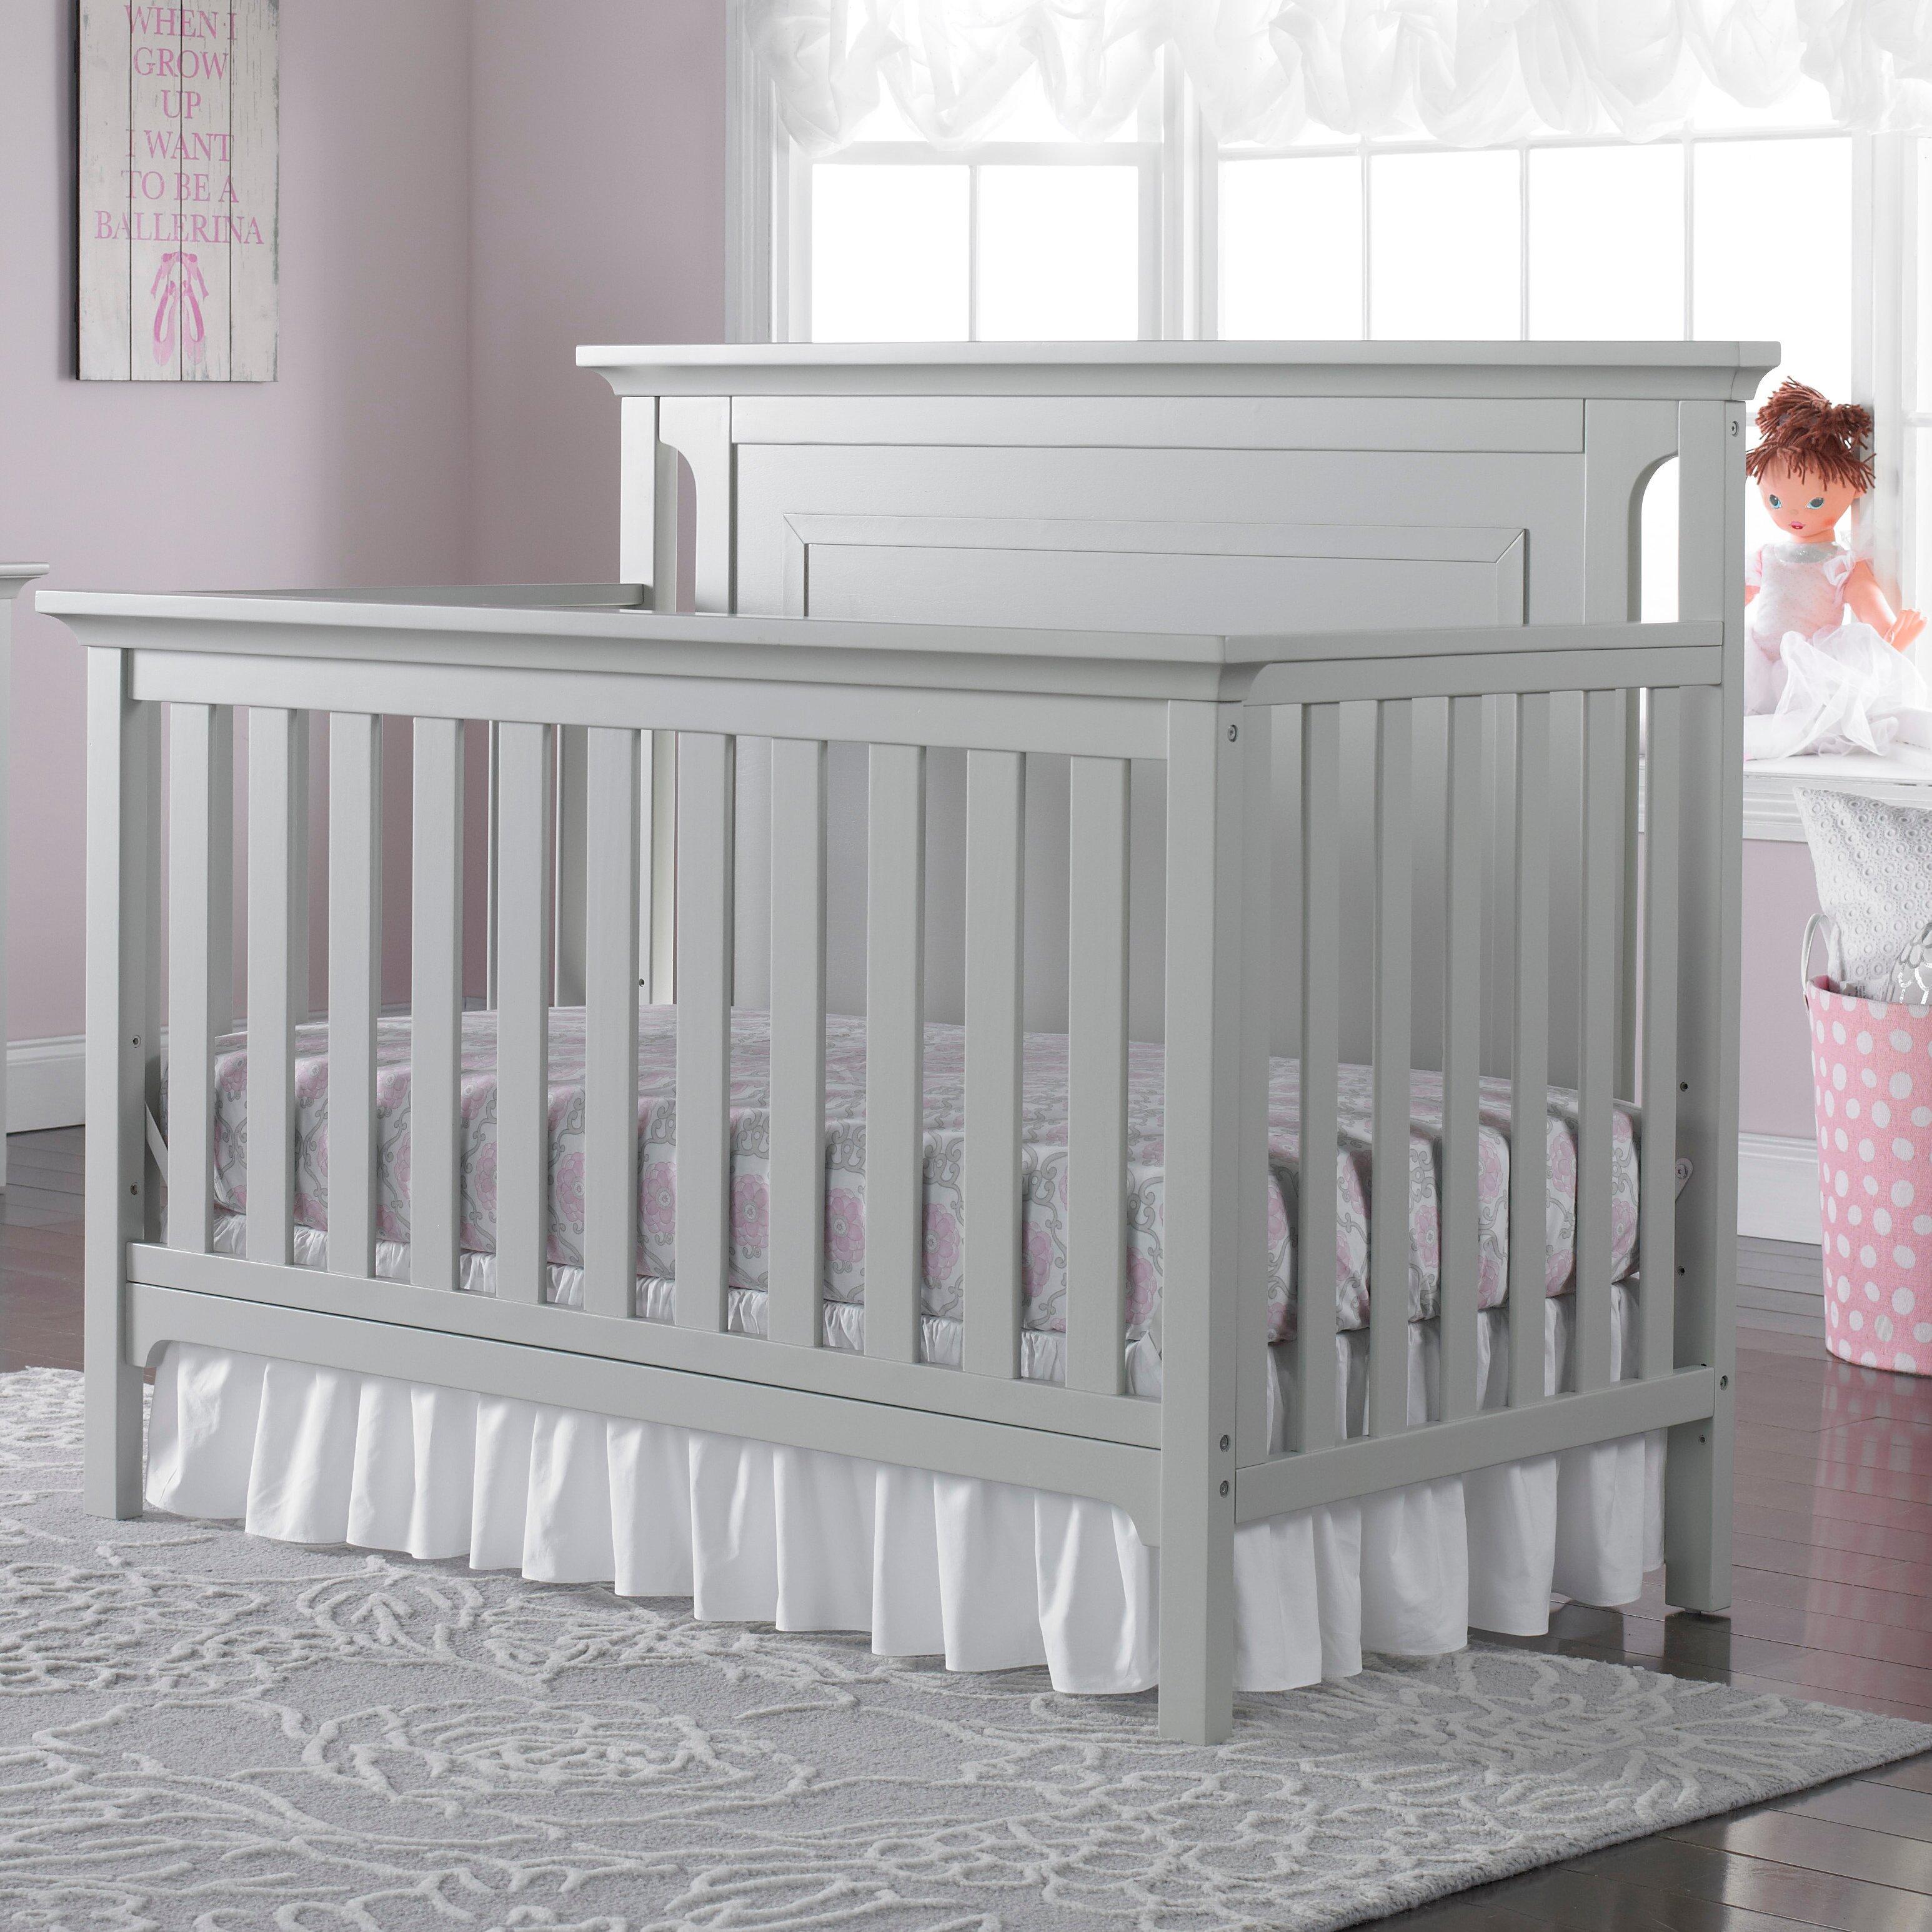 Emma iron crib for sale - Ti Amo Carino 4 In 1 Convertible Crib